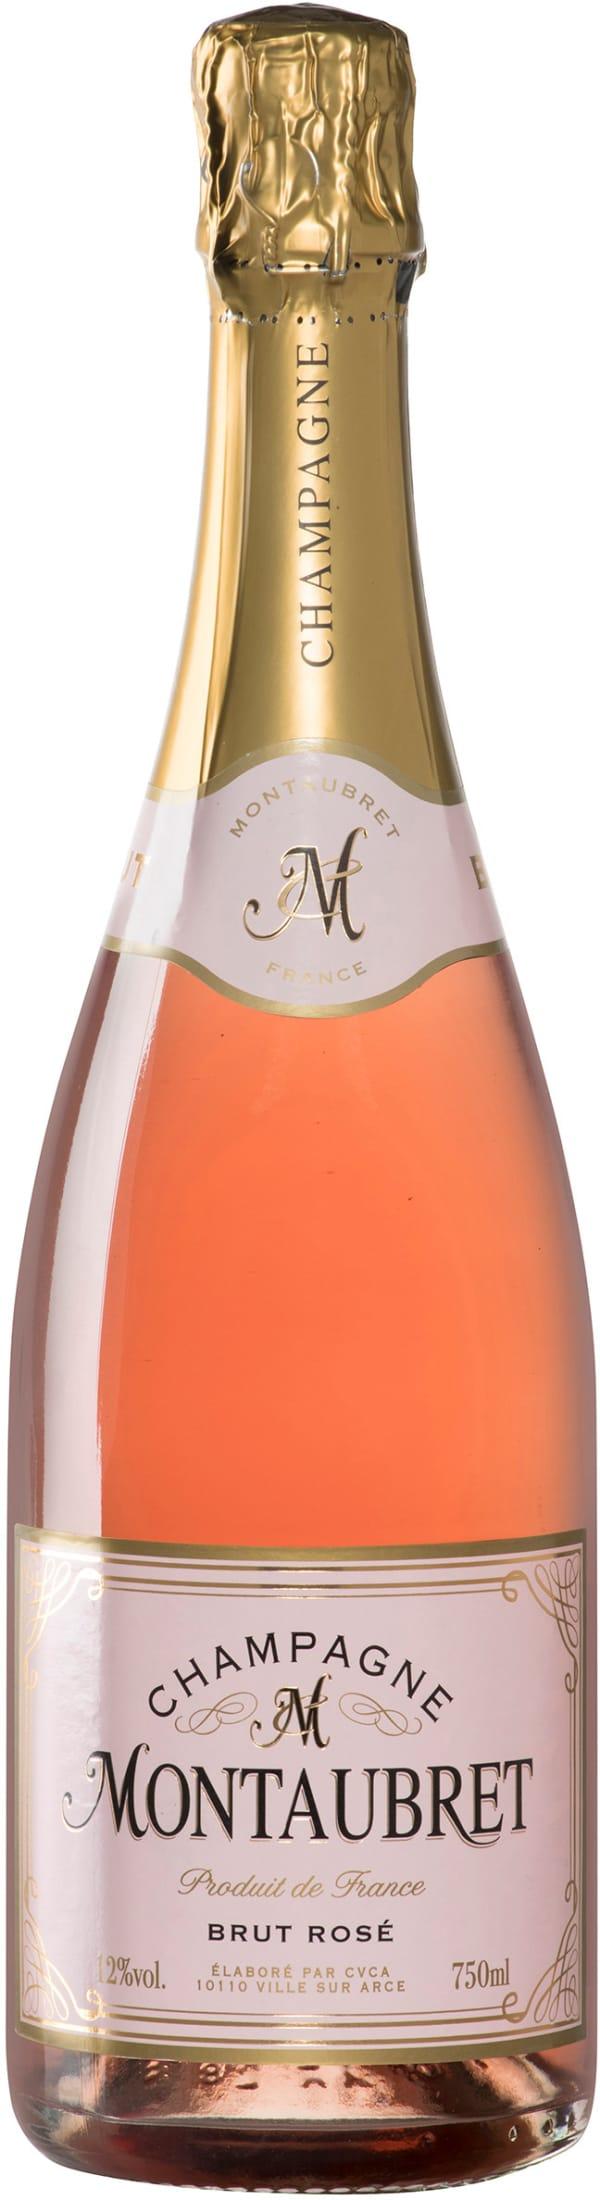 Montaubret Rosé Champagne Brut